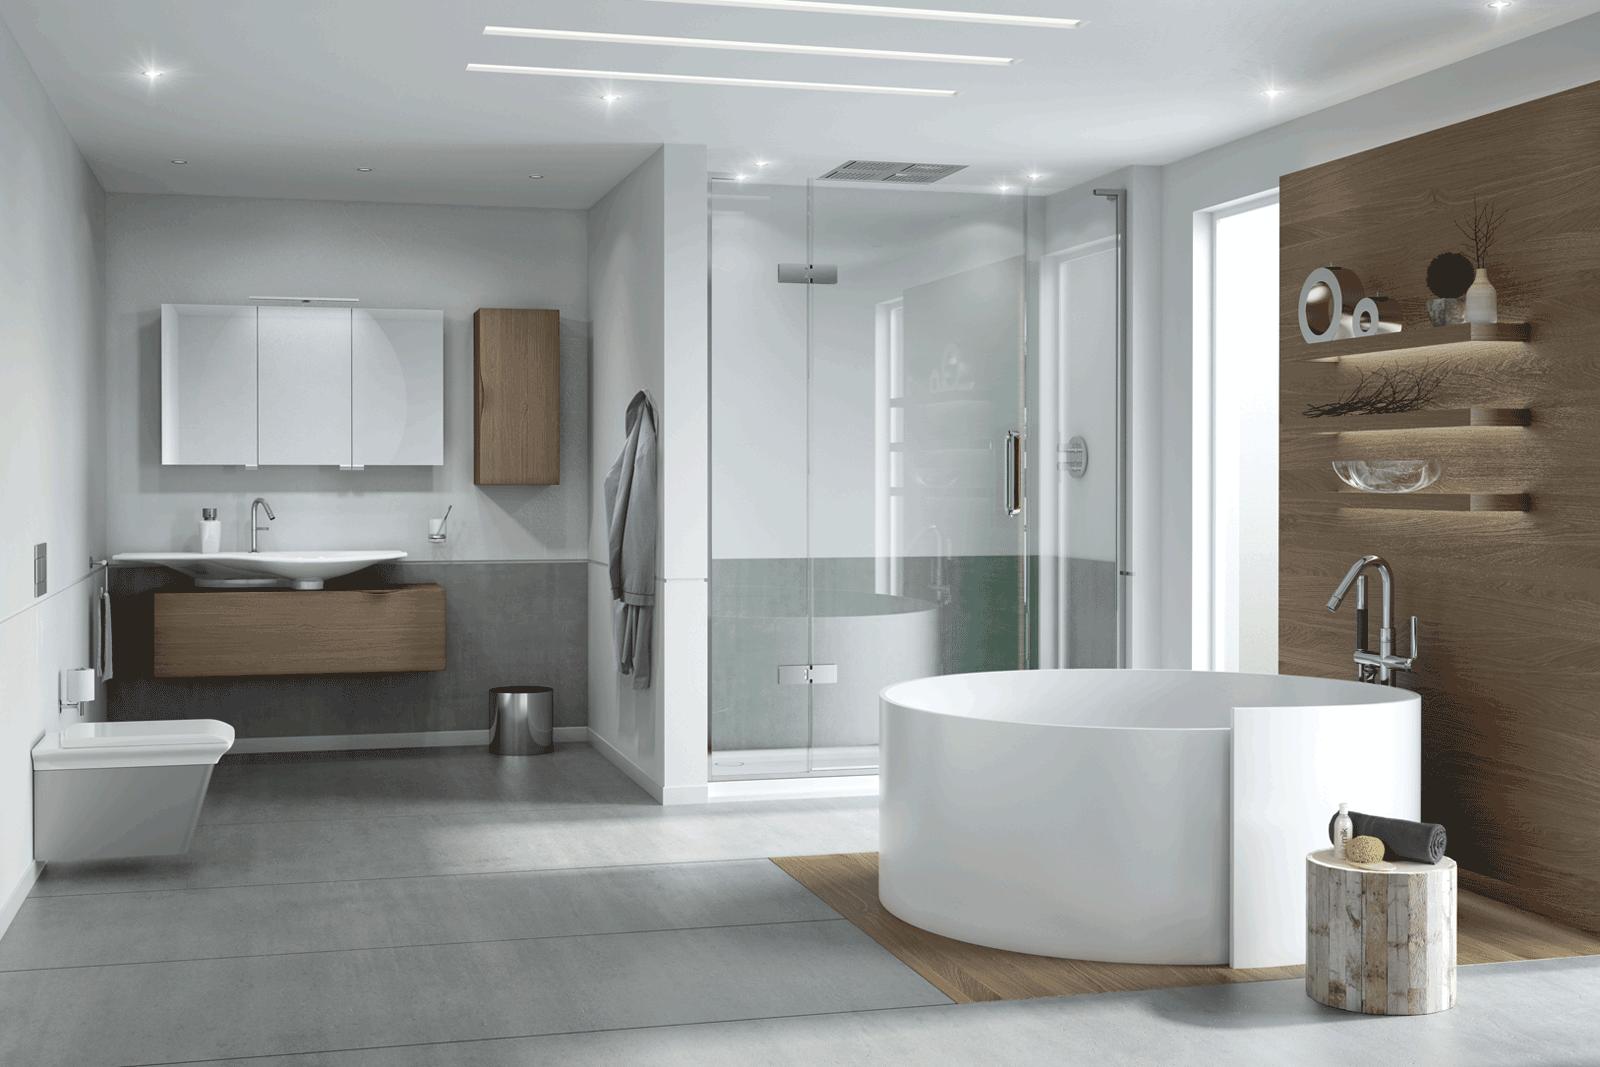 BATHLINE Bathroom Design | Bathrooms Northern Ireland ... on Bathroom Models  id=96055